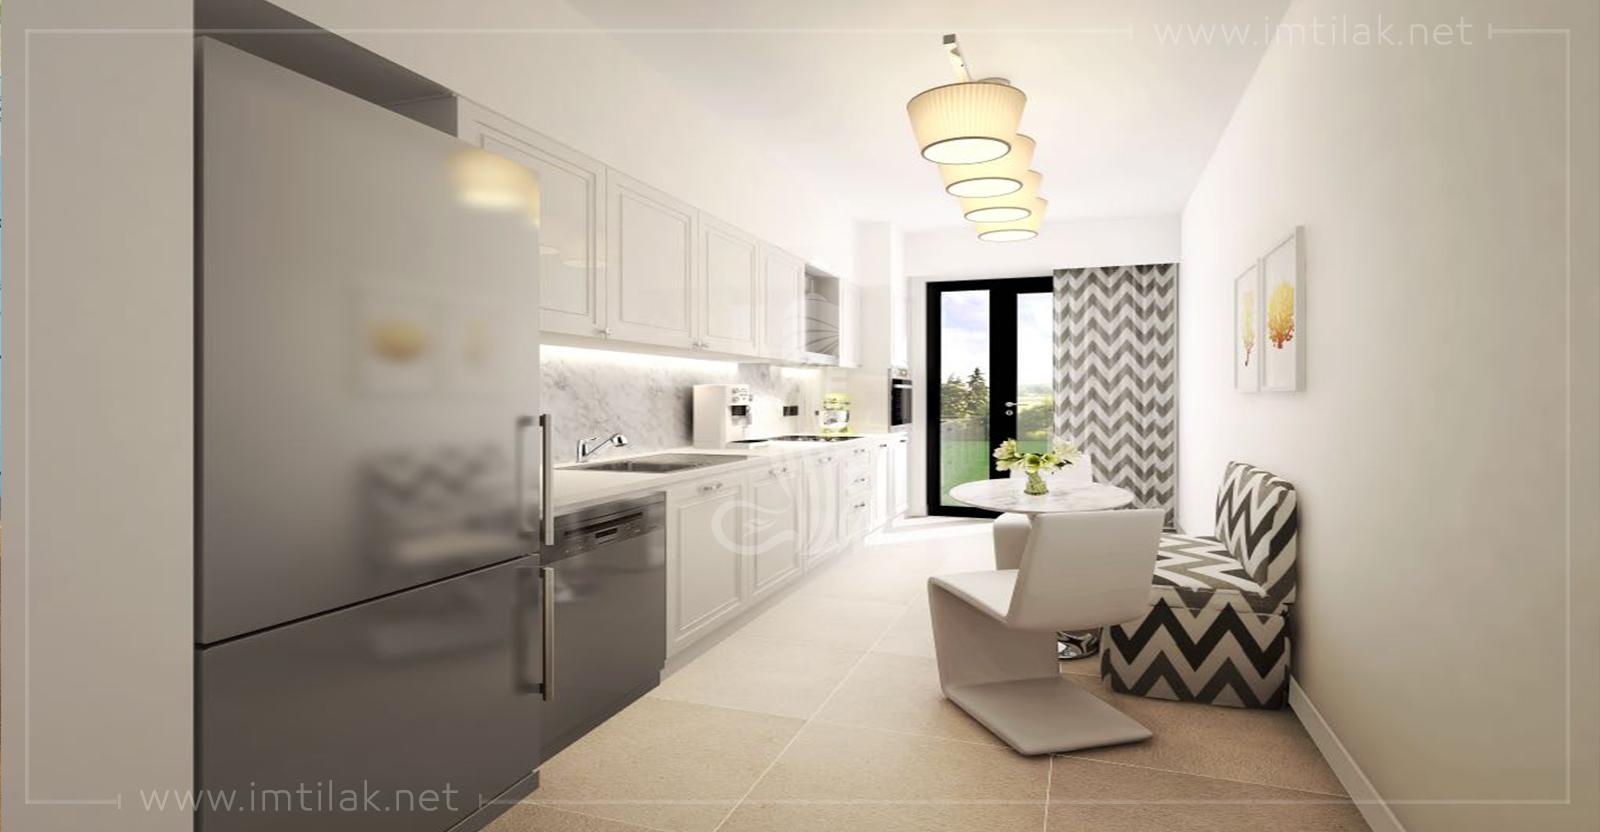 IMT – 255  Résidence Moderne